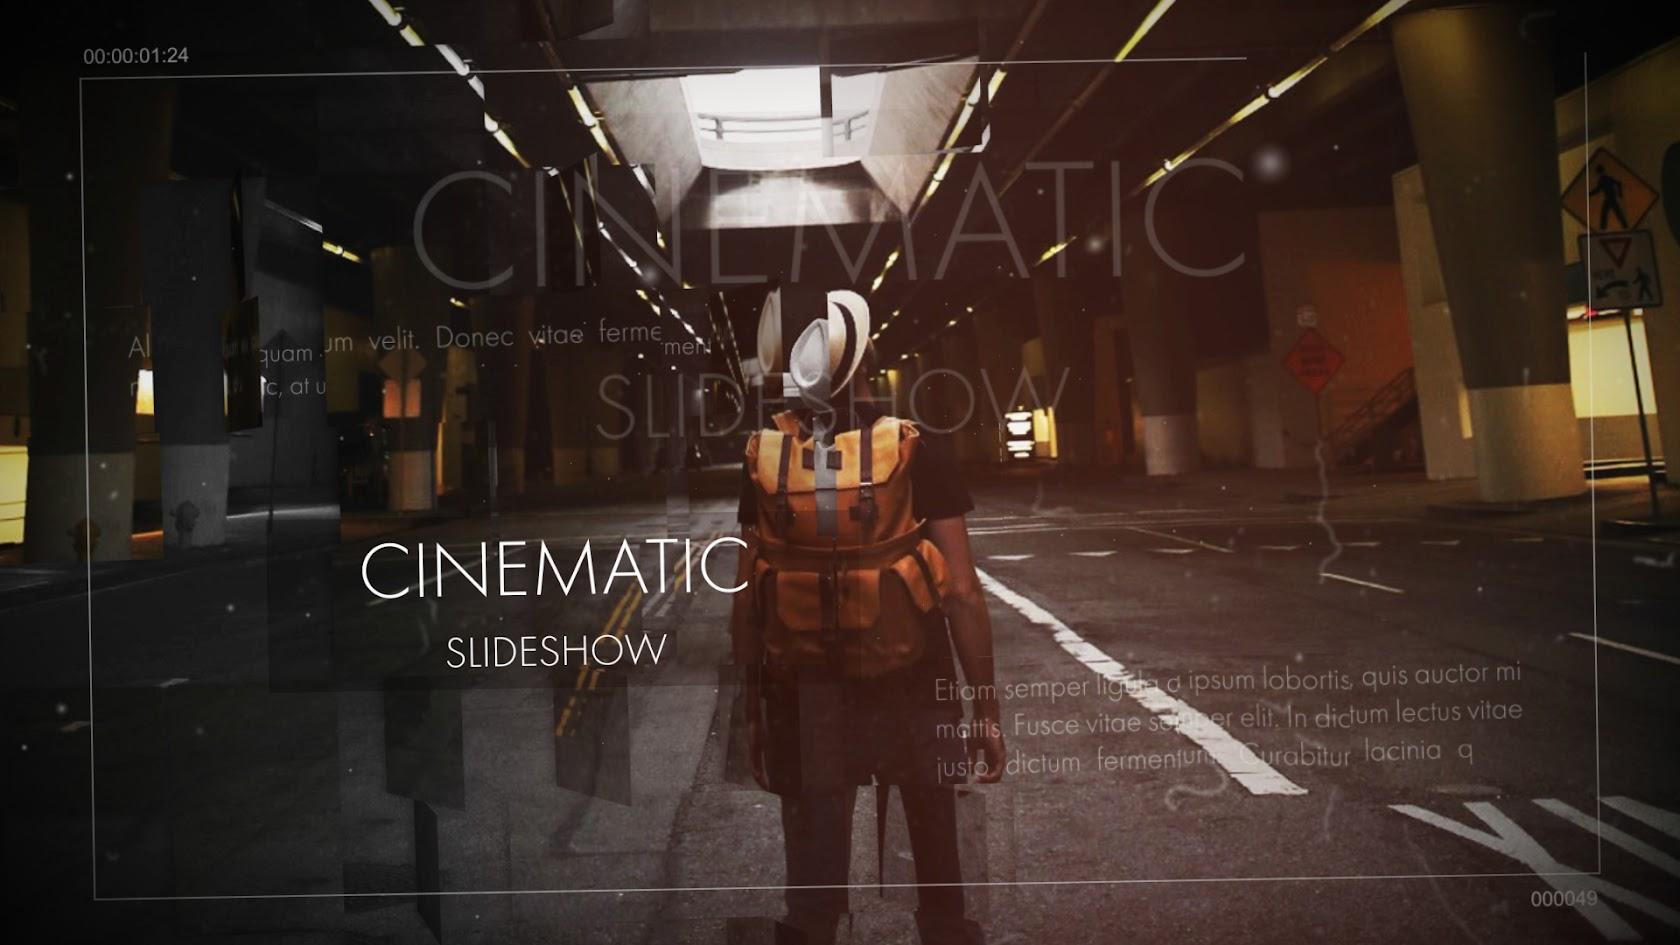 Cinematic Slideshow - 10